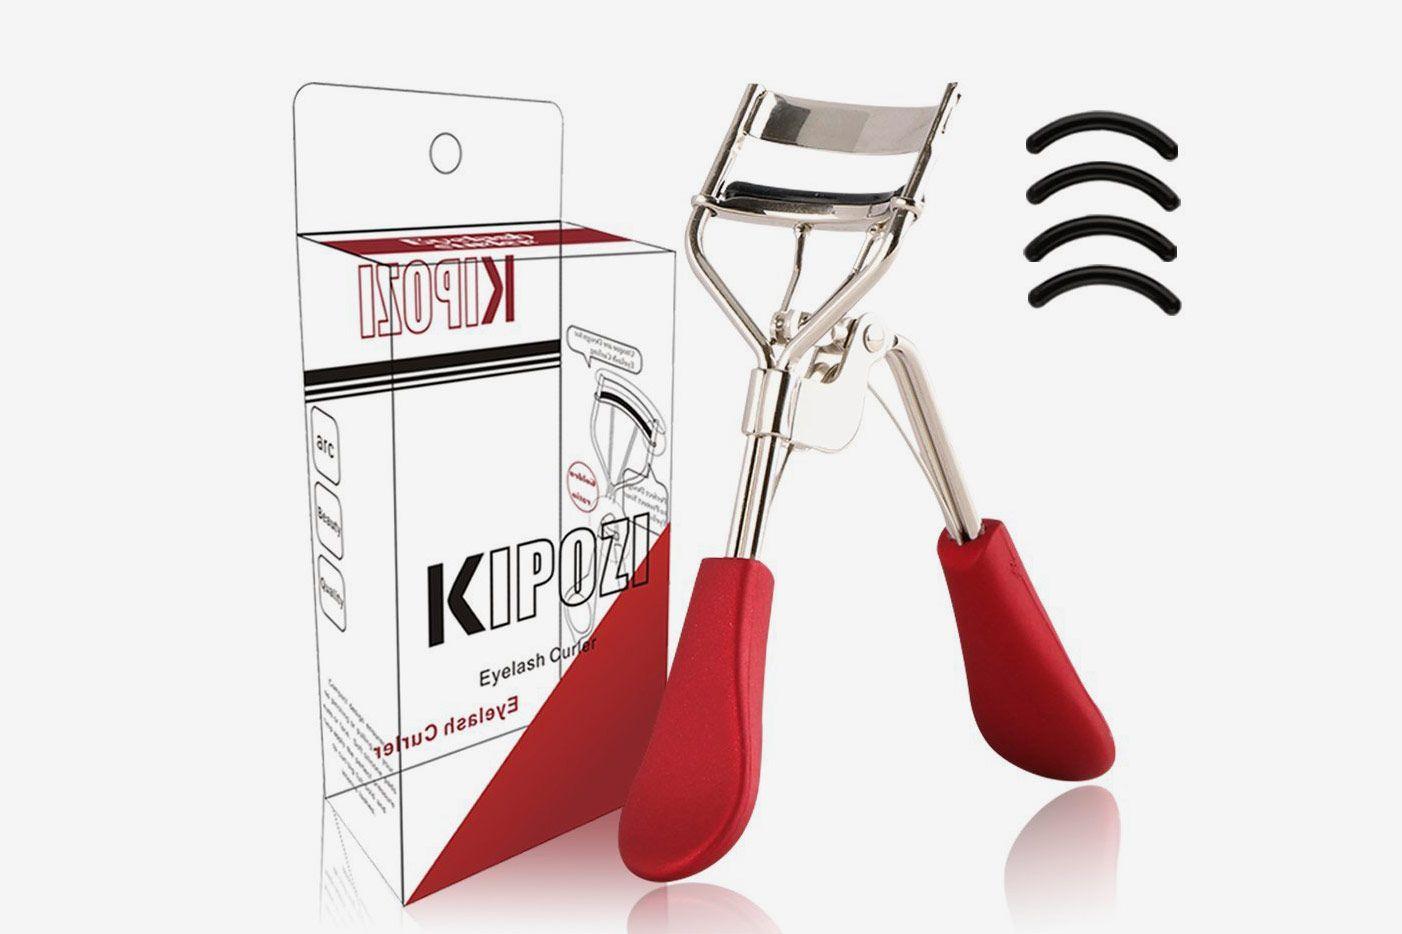 Kipozi Eyelash Curler With Refills